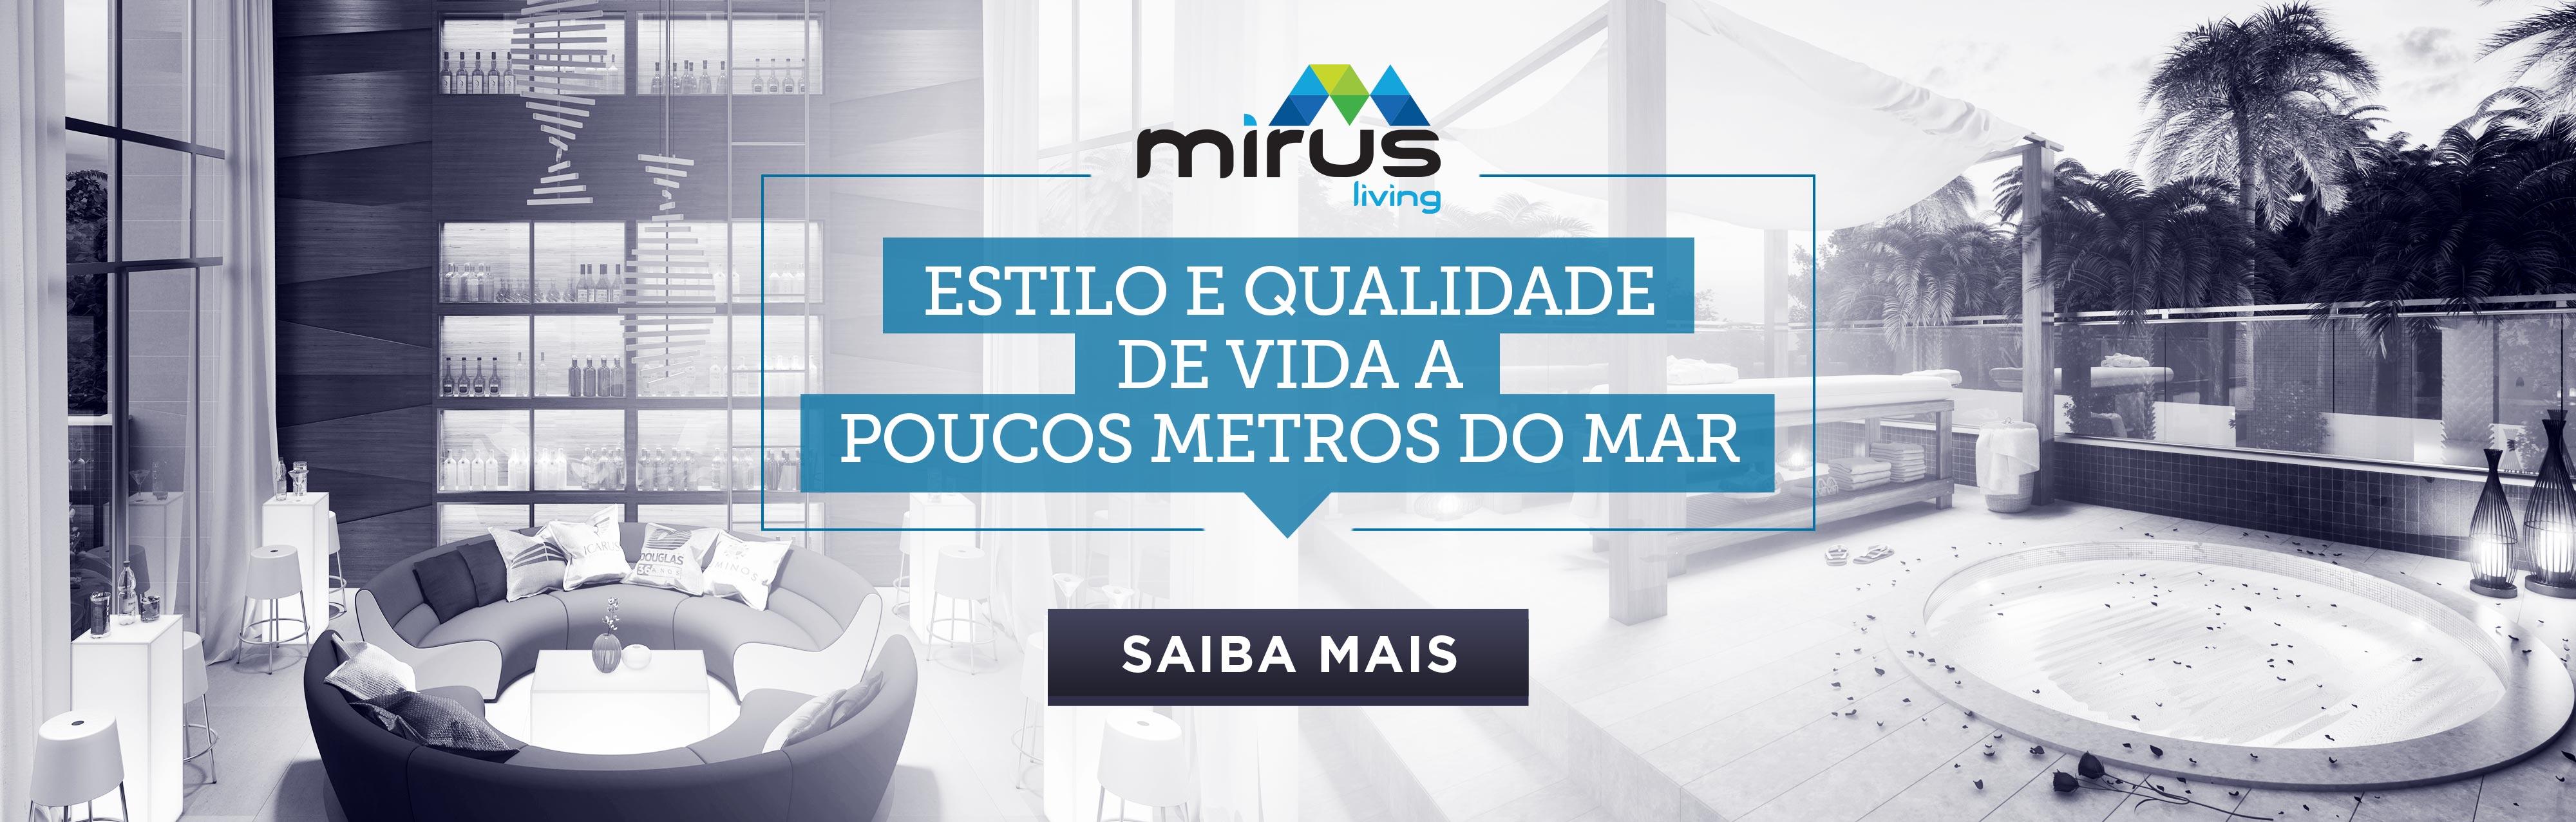 Banner-Mirus